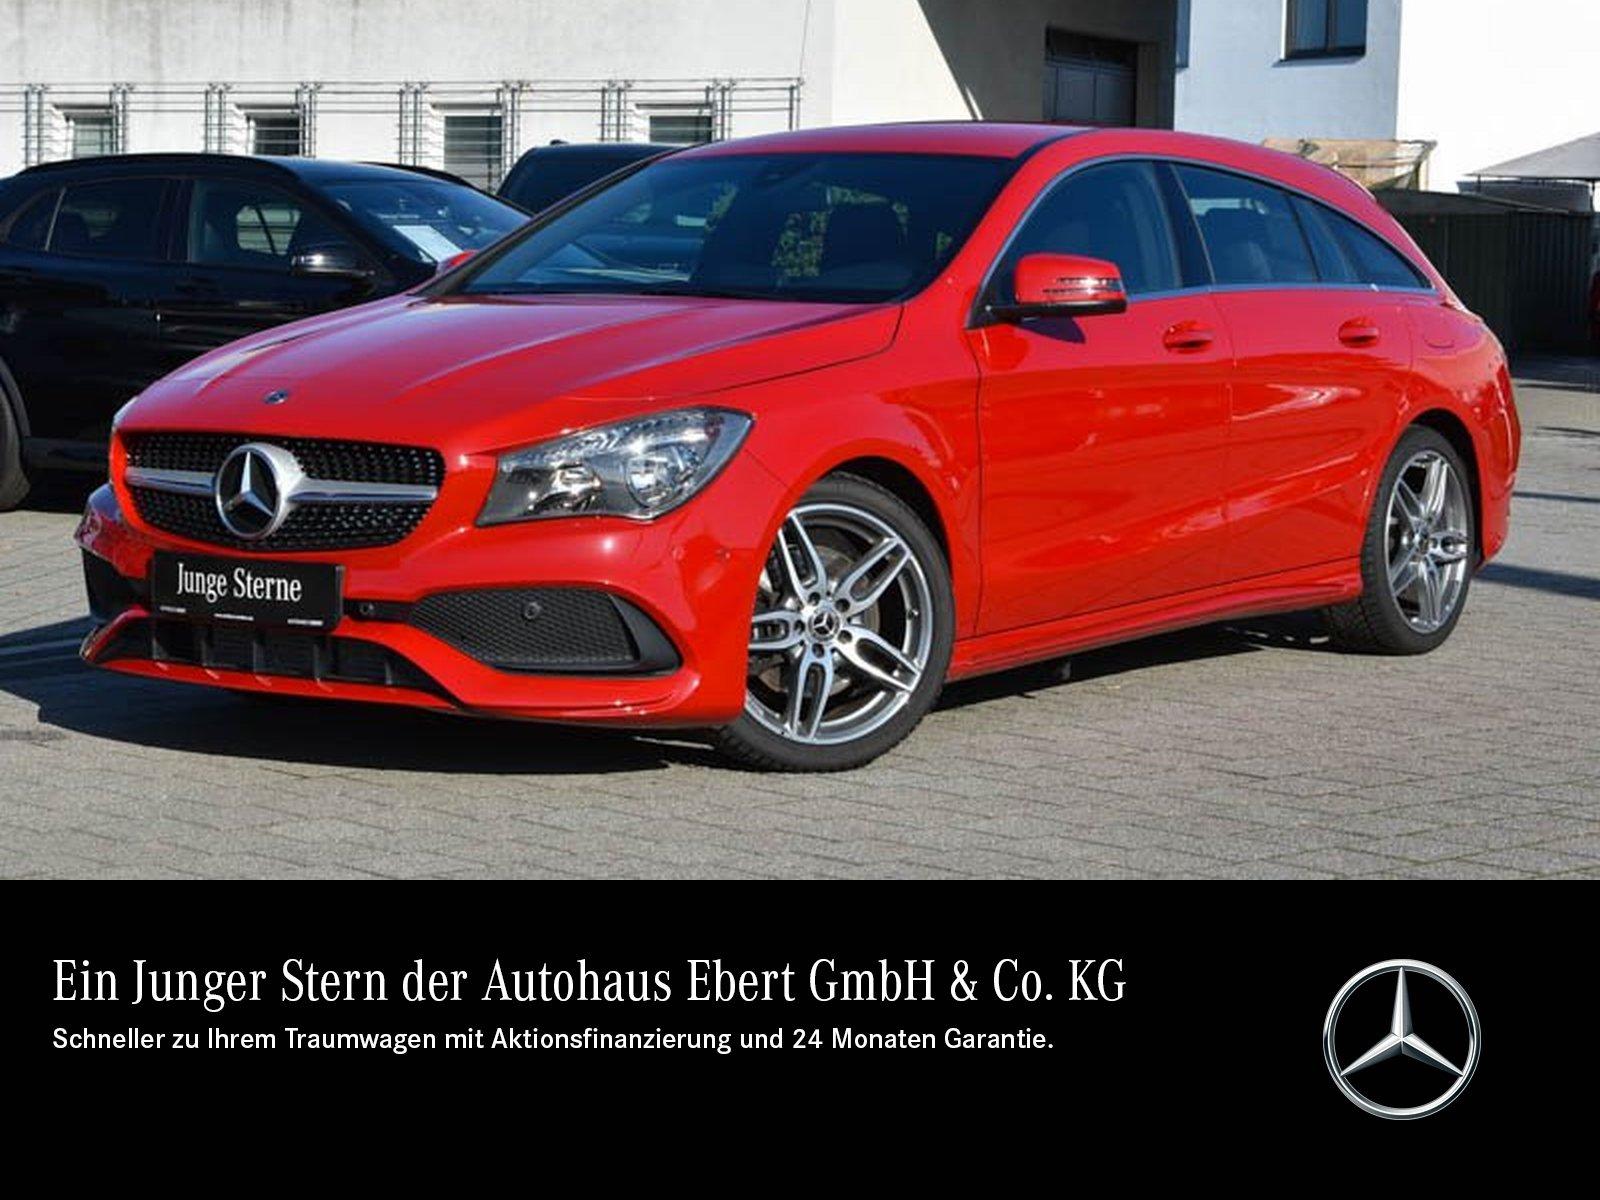 Mercedes-Benz CLA 250 SB AMG 7G-DCT+NAVI+RFK+BUSINESS, Jahr 2017, Benzin